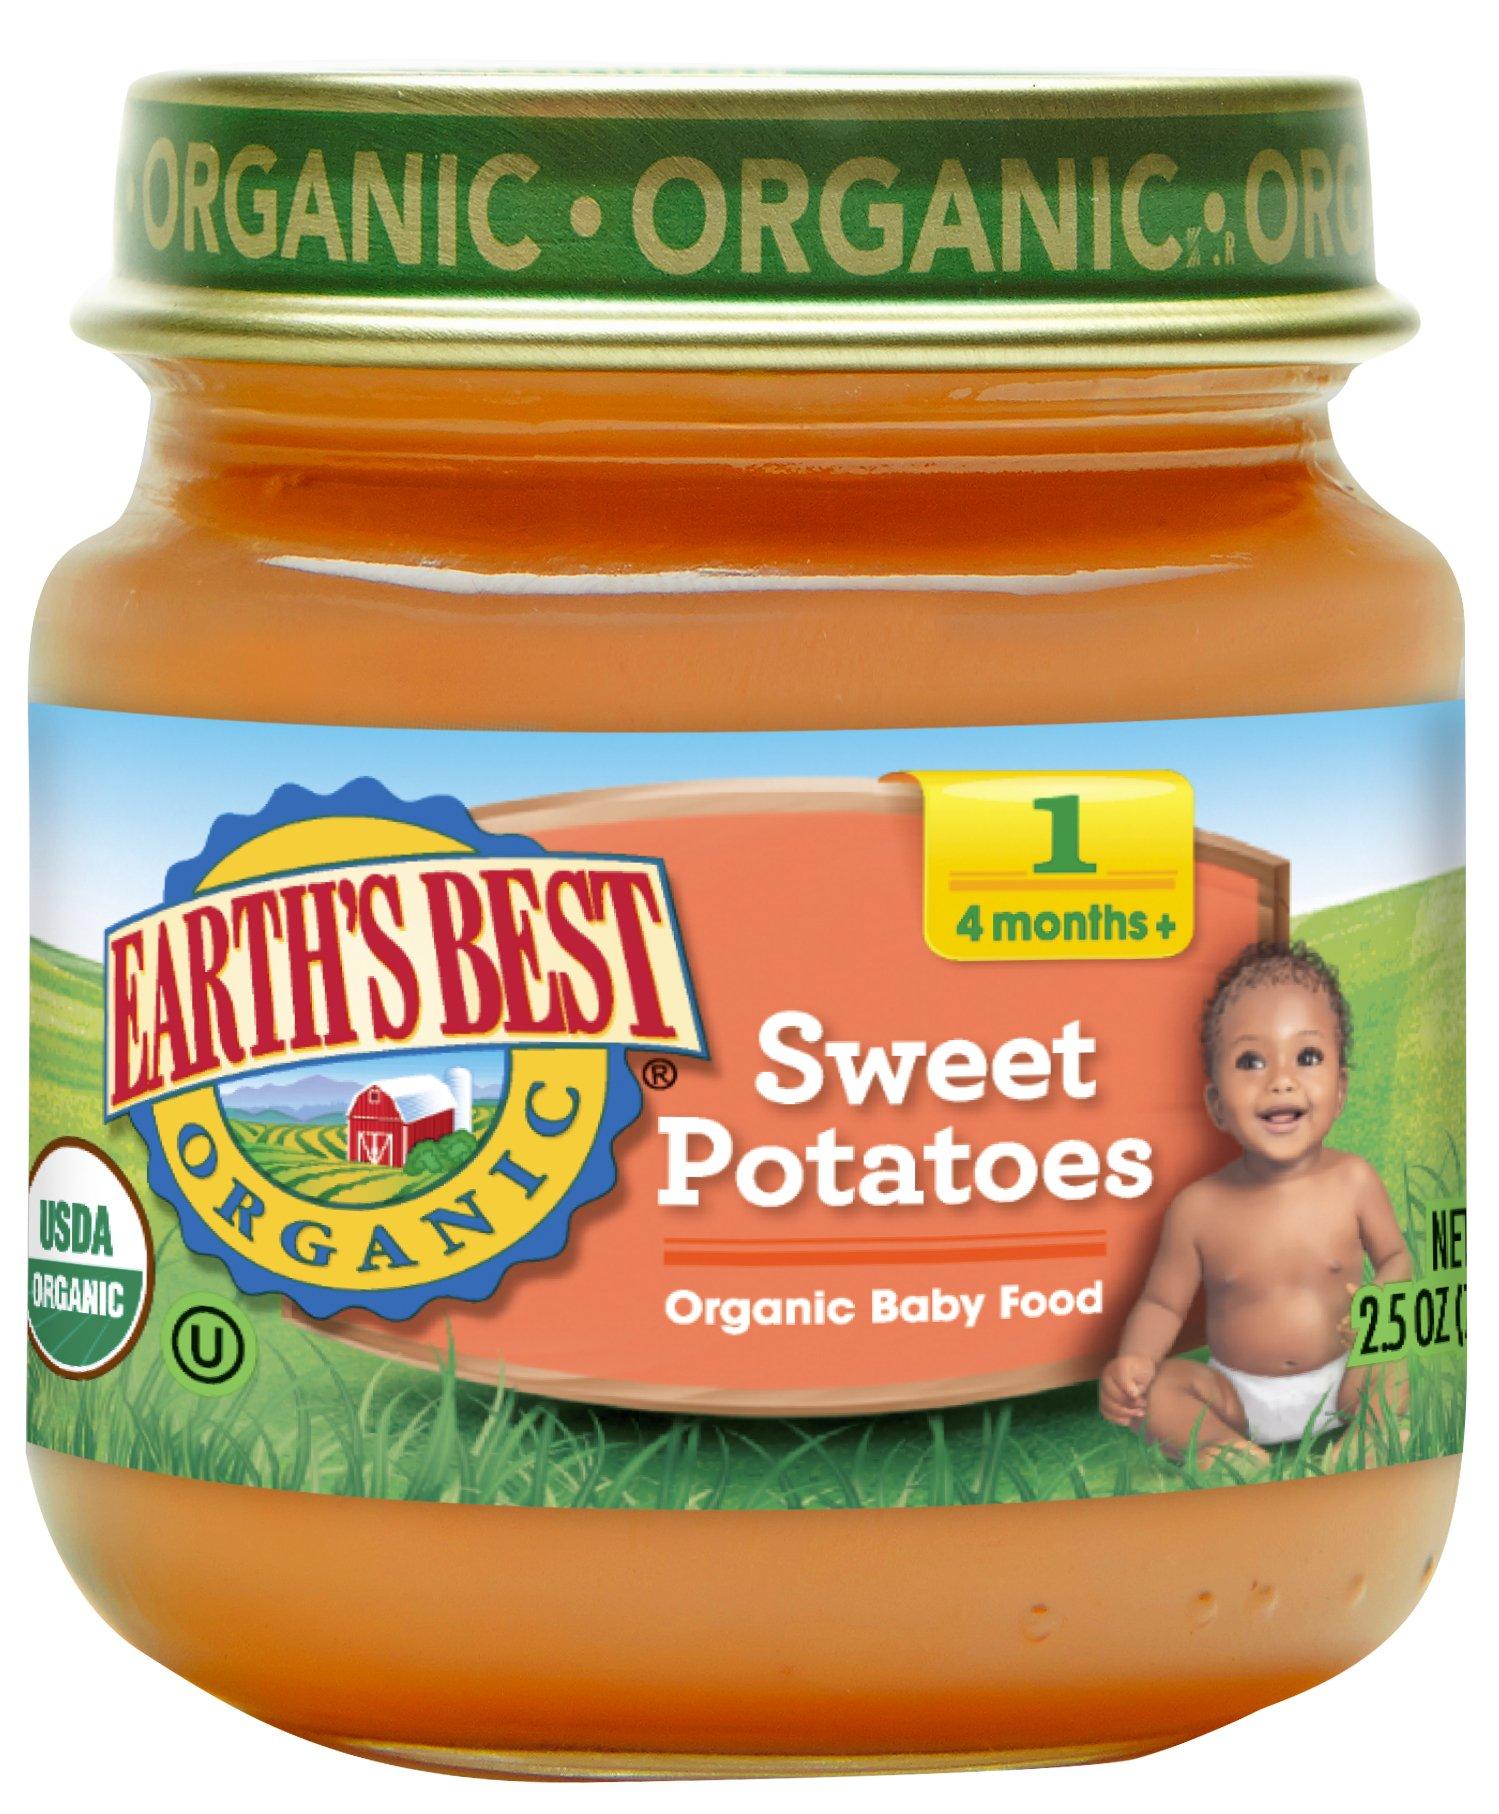 Earth's Best Organic Stage 1 Baby Food, Sweet Potato, 2.5 oz. Jar